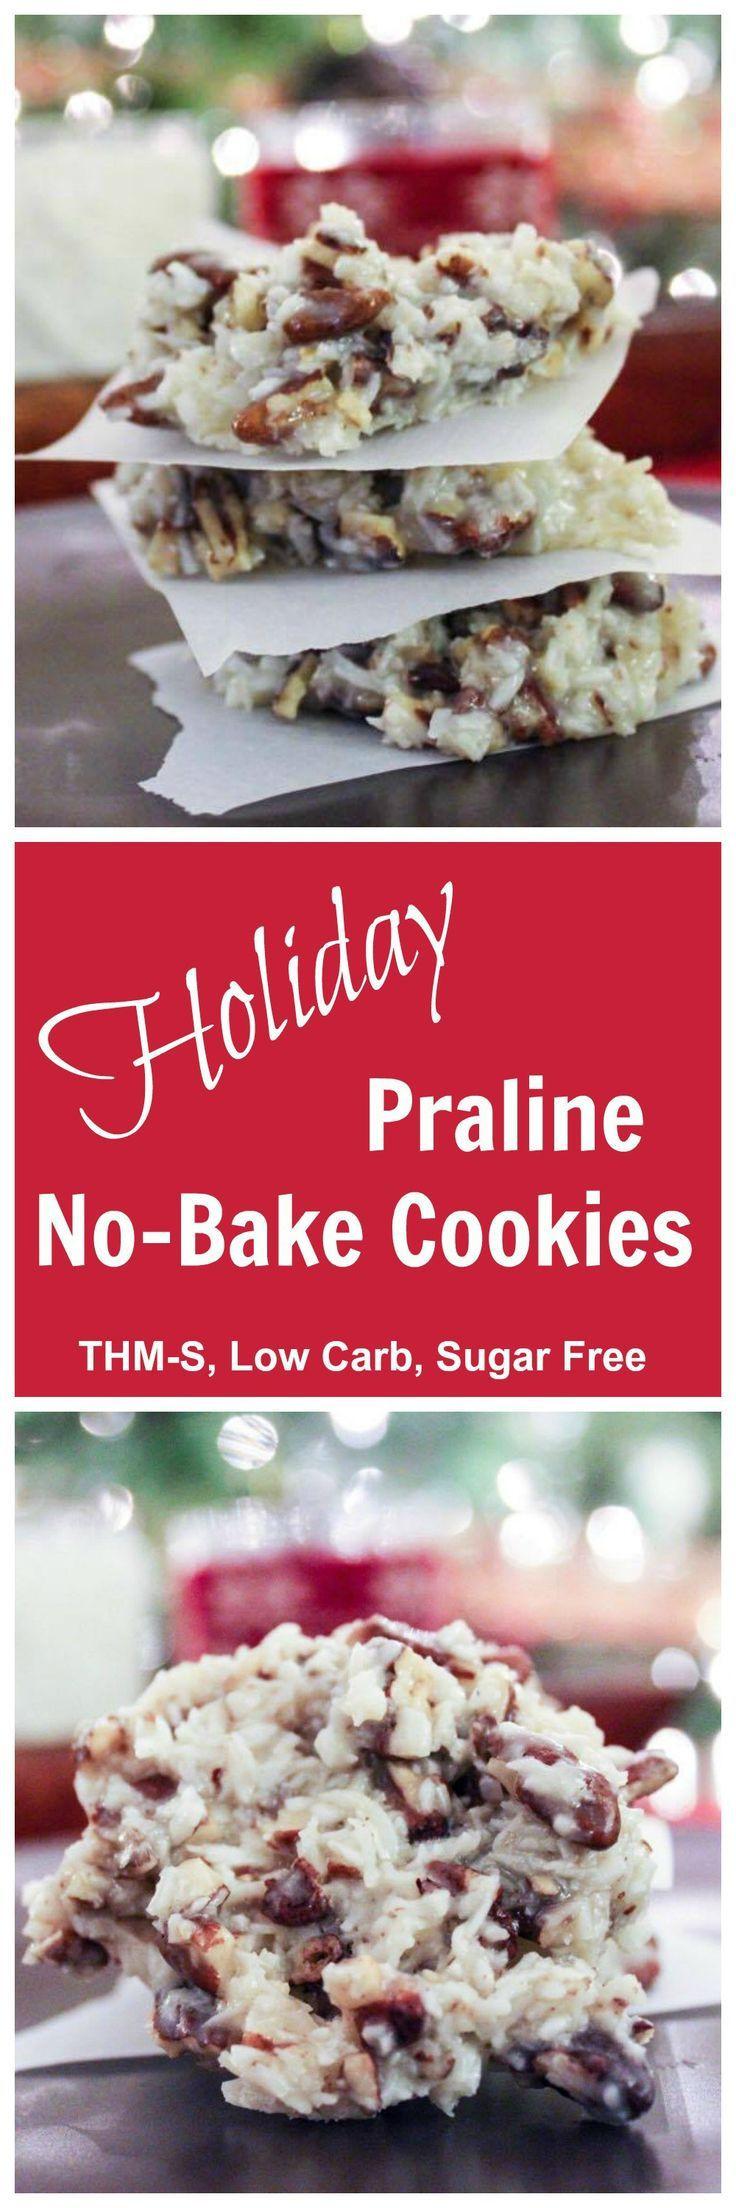 Christmas No Bake Cookies  Best 25 No bake christmas cookies ideas on Pinterest